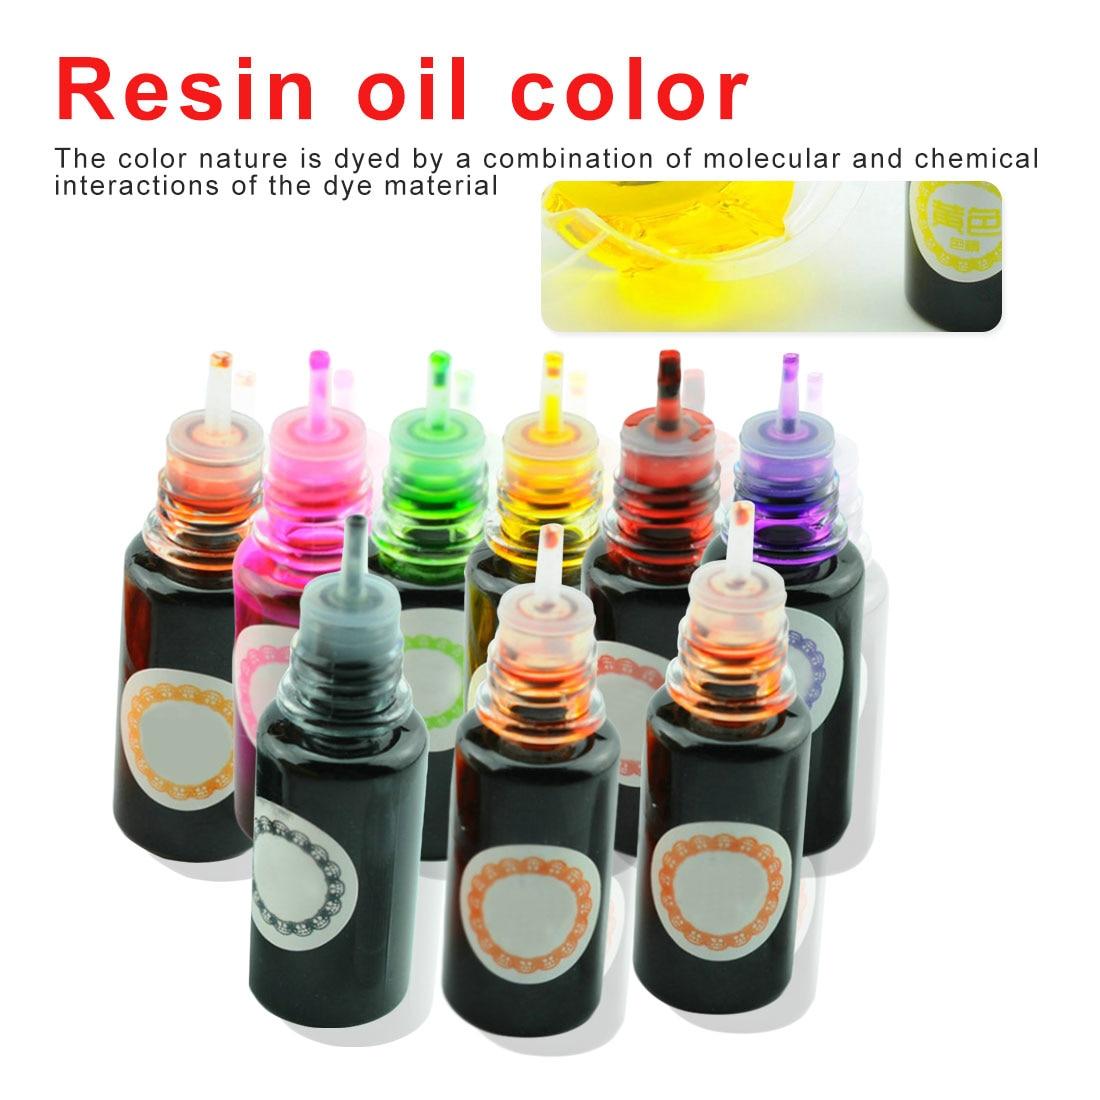 Soap Making 10ml Handmade Soap Dye Pigments Base Color Liquid Pigment DIY Manual Soap Colorant Tool Kit